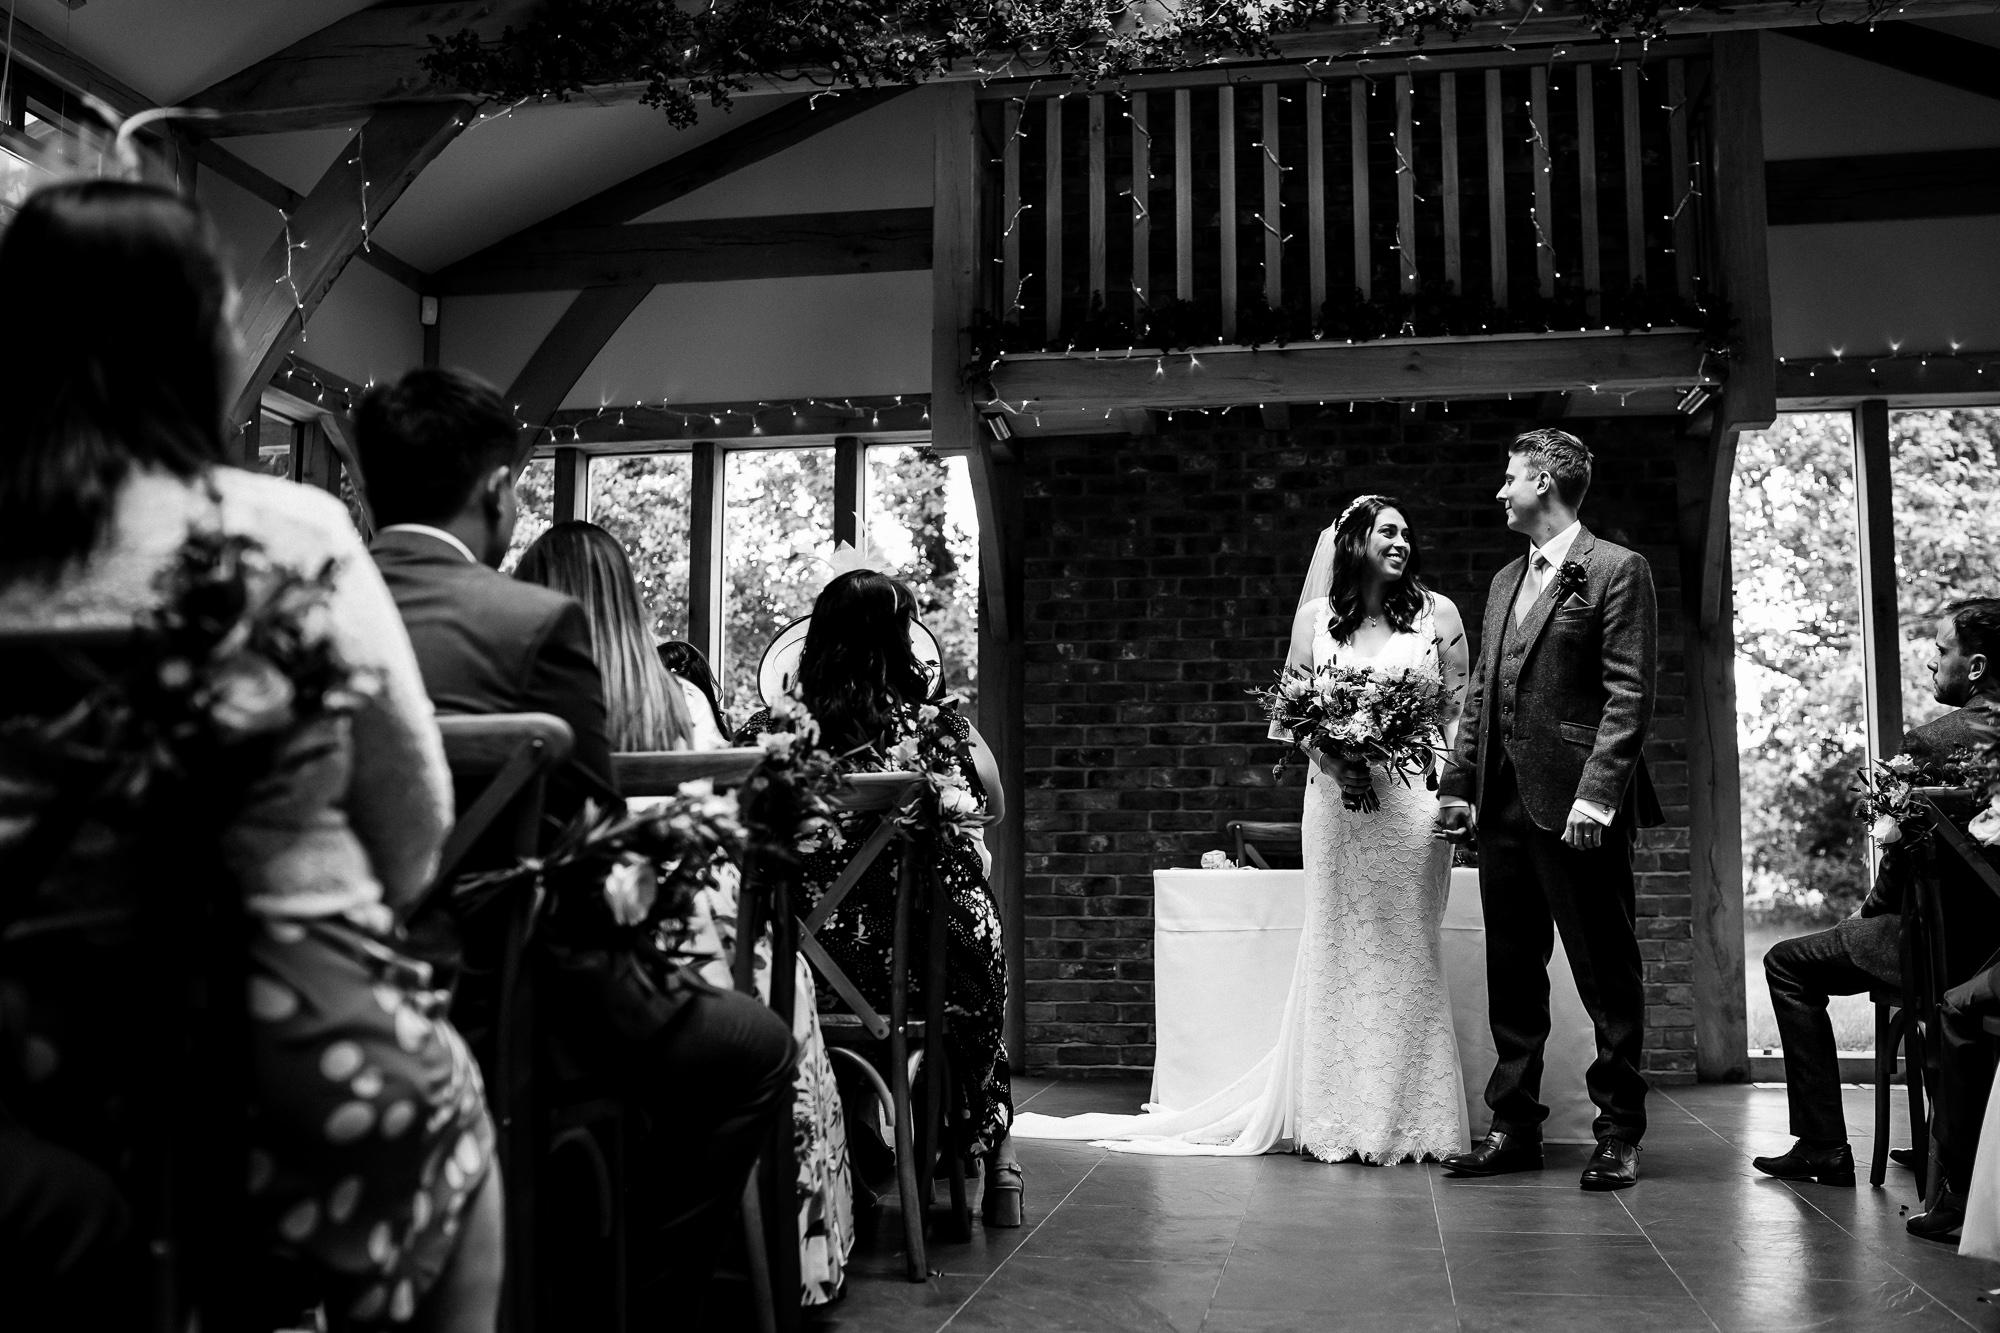 Oak tree of peover wedding photography cheshire wedding photographer (23 of 56).jpg